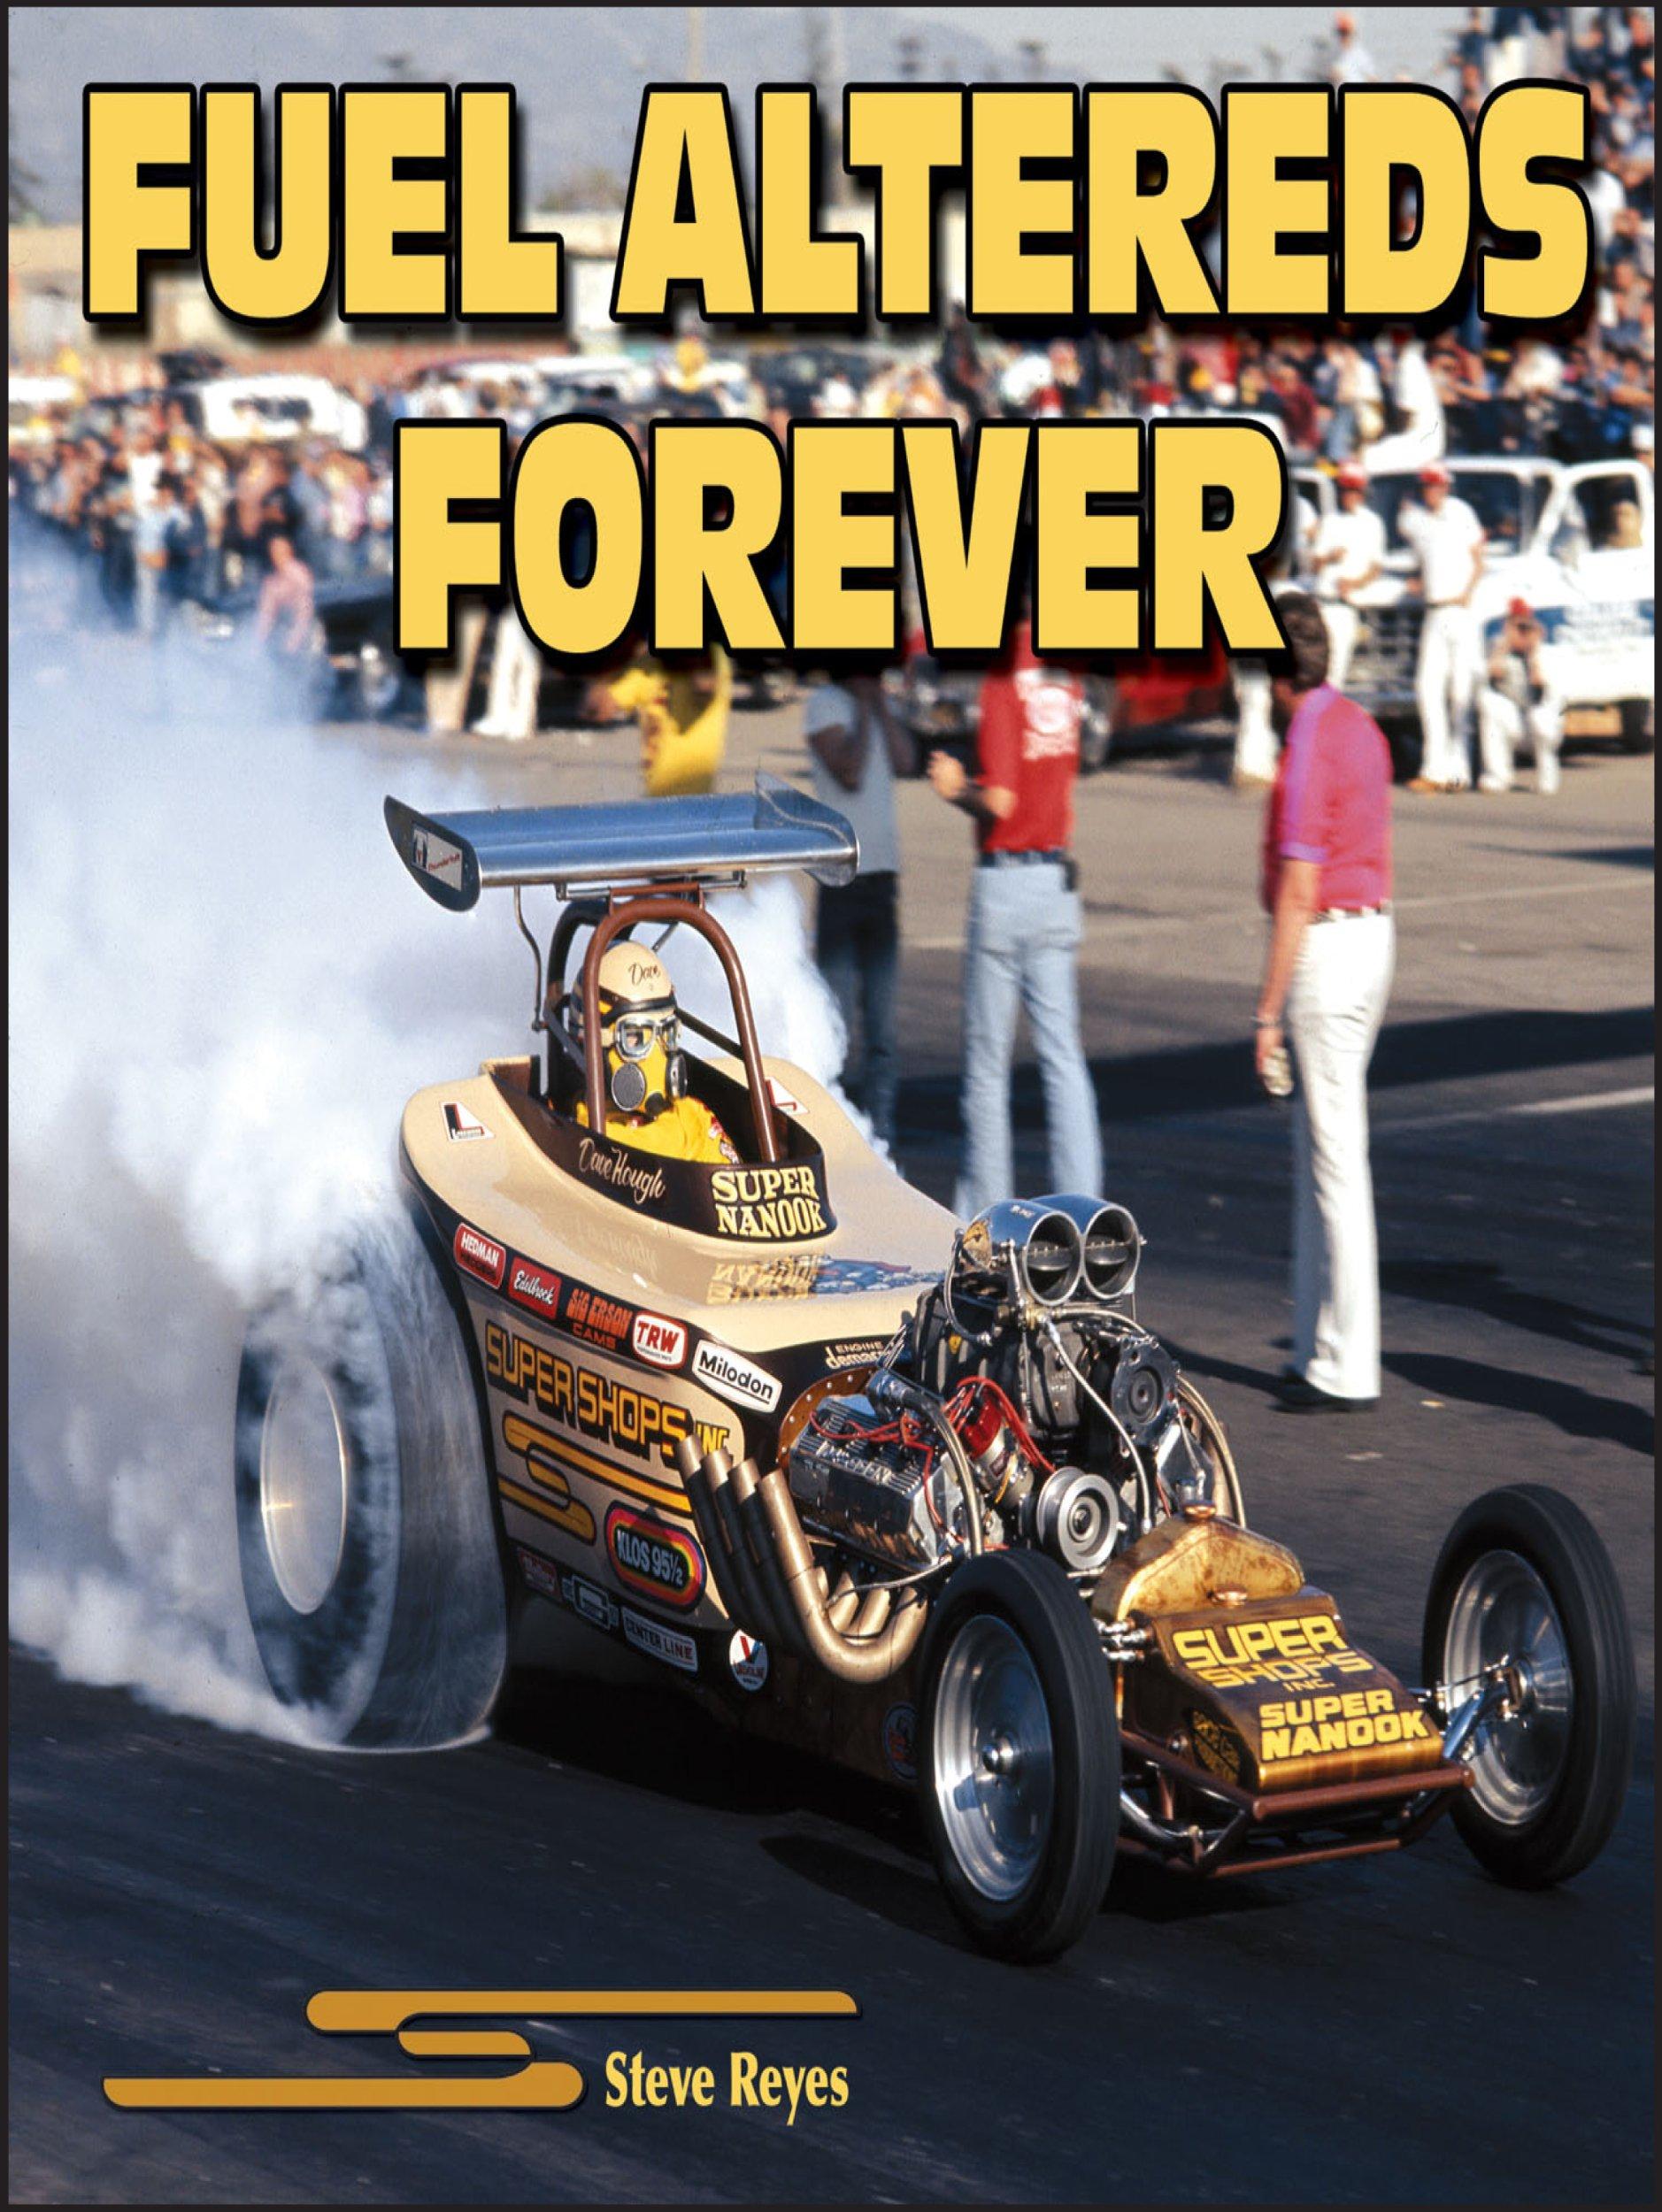 Fuel Altereds Forever ebook